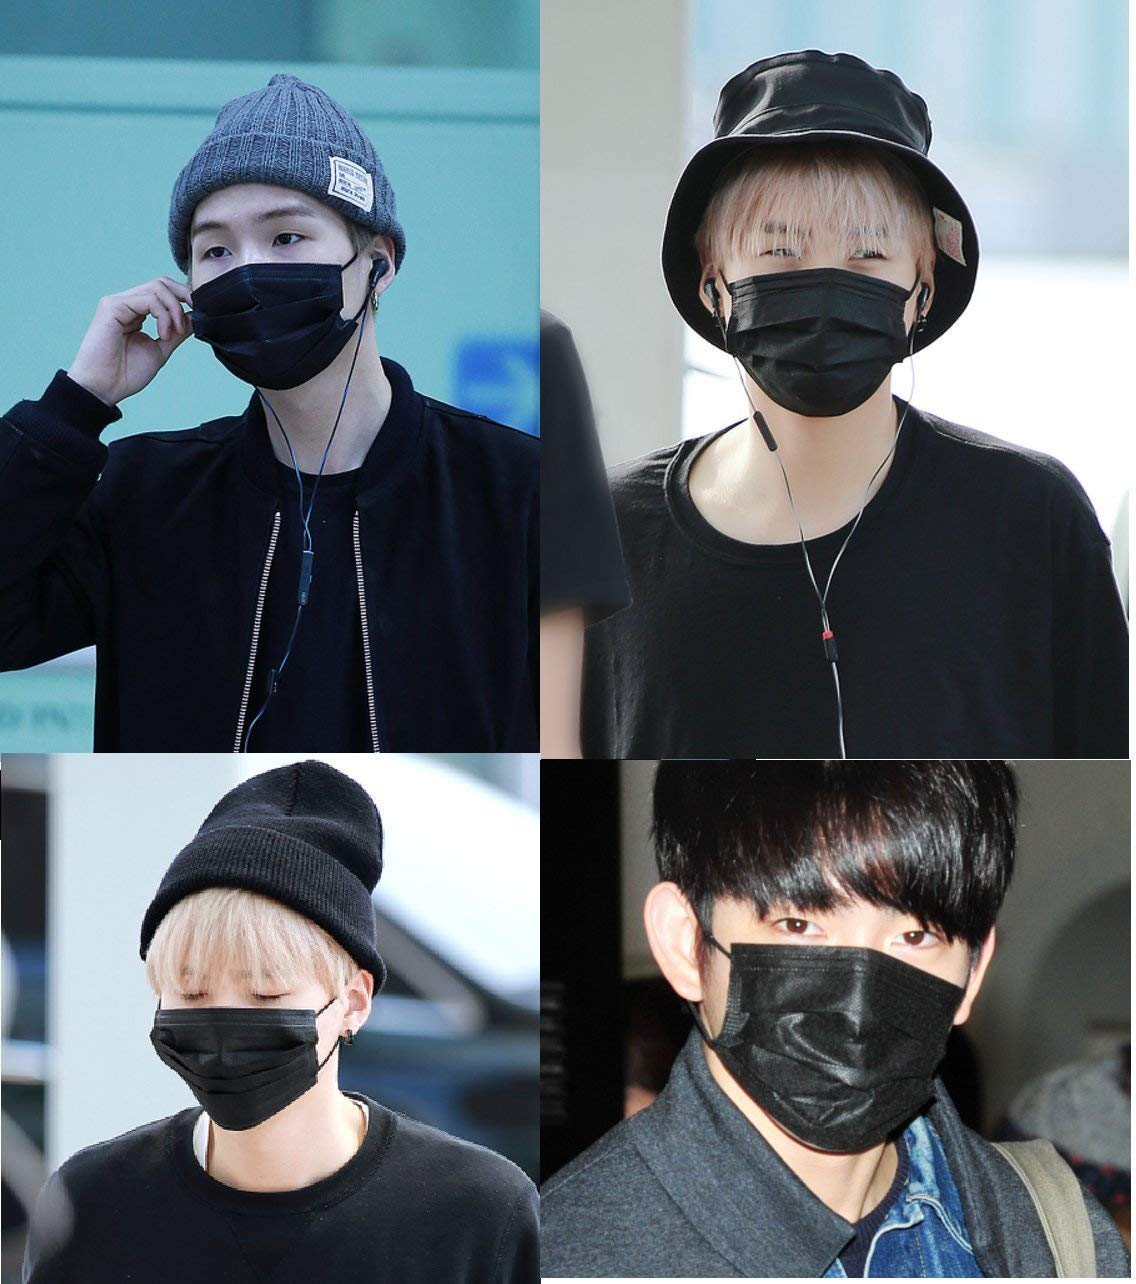 bts surgical mask